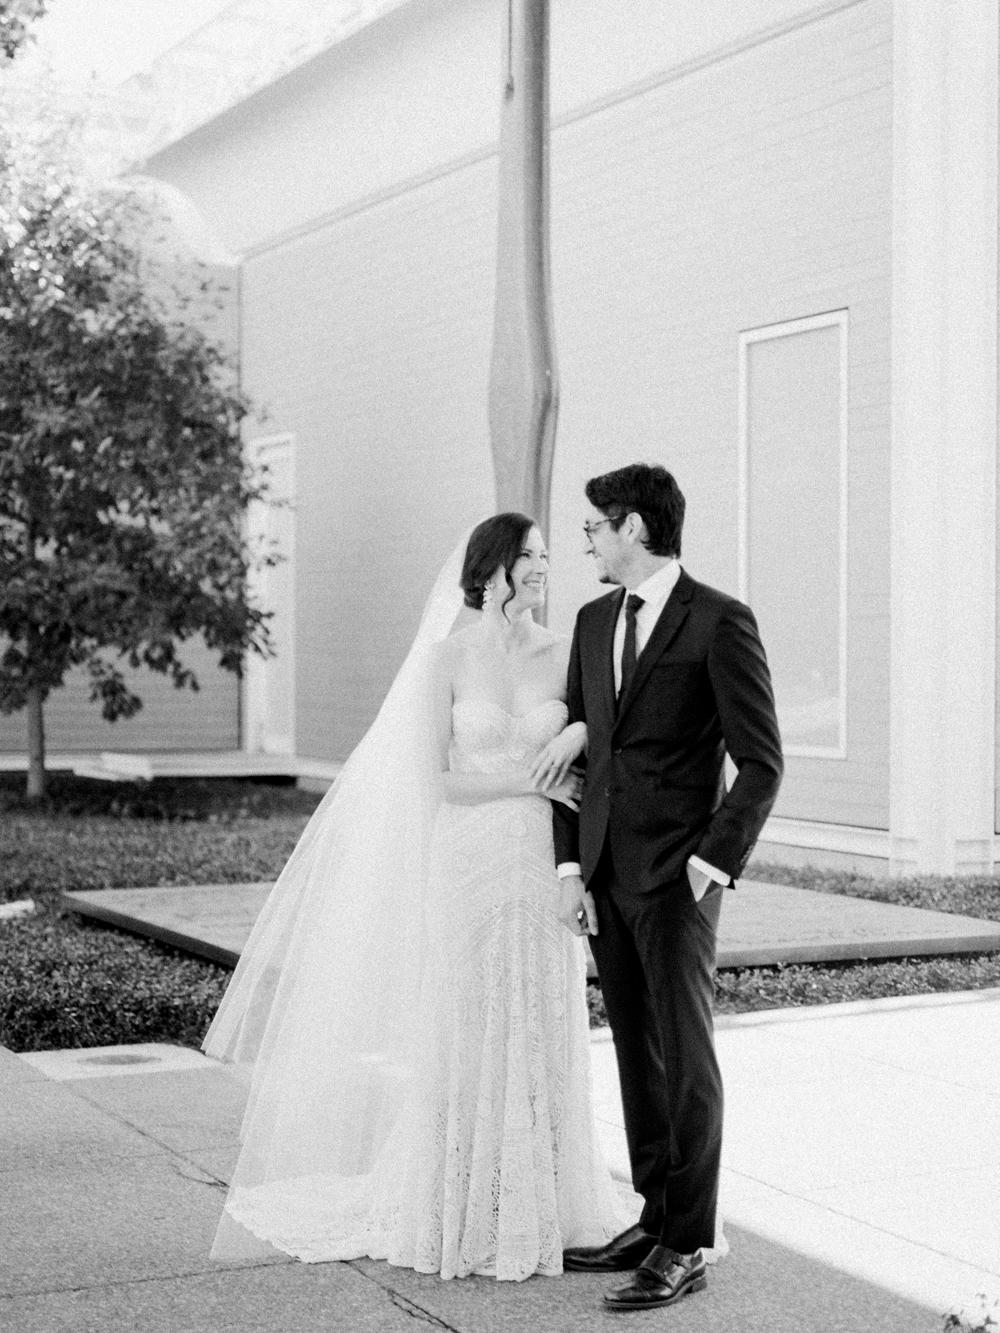 fall wedding at rothko chapel- houston wedding photographer-christine gosch - film photographer - elopement photographer- intimate wedding - lovely bride wedding gown-10.jpg